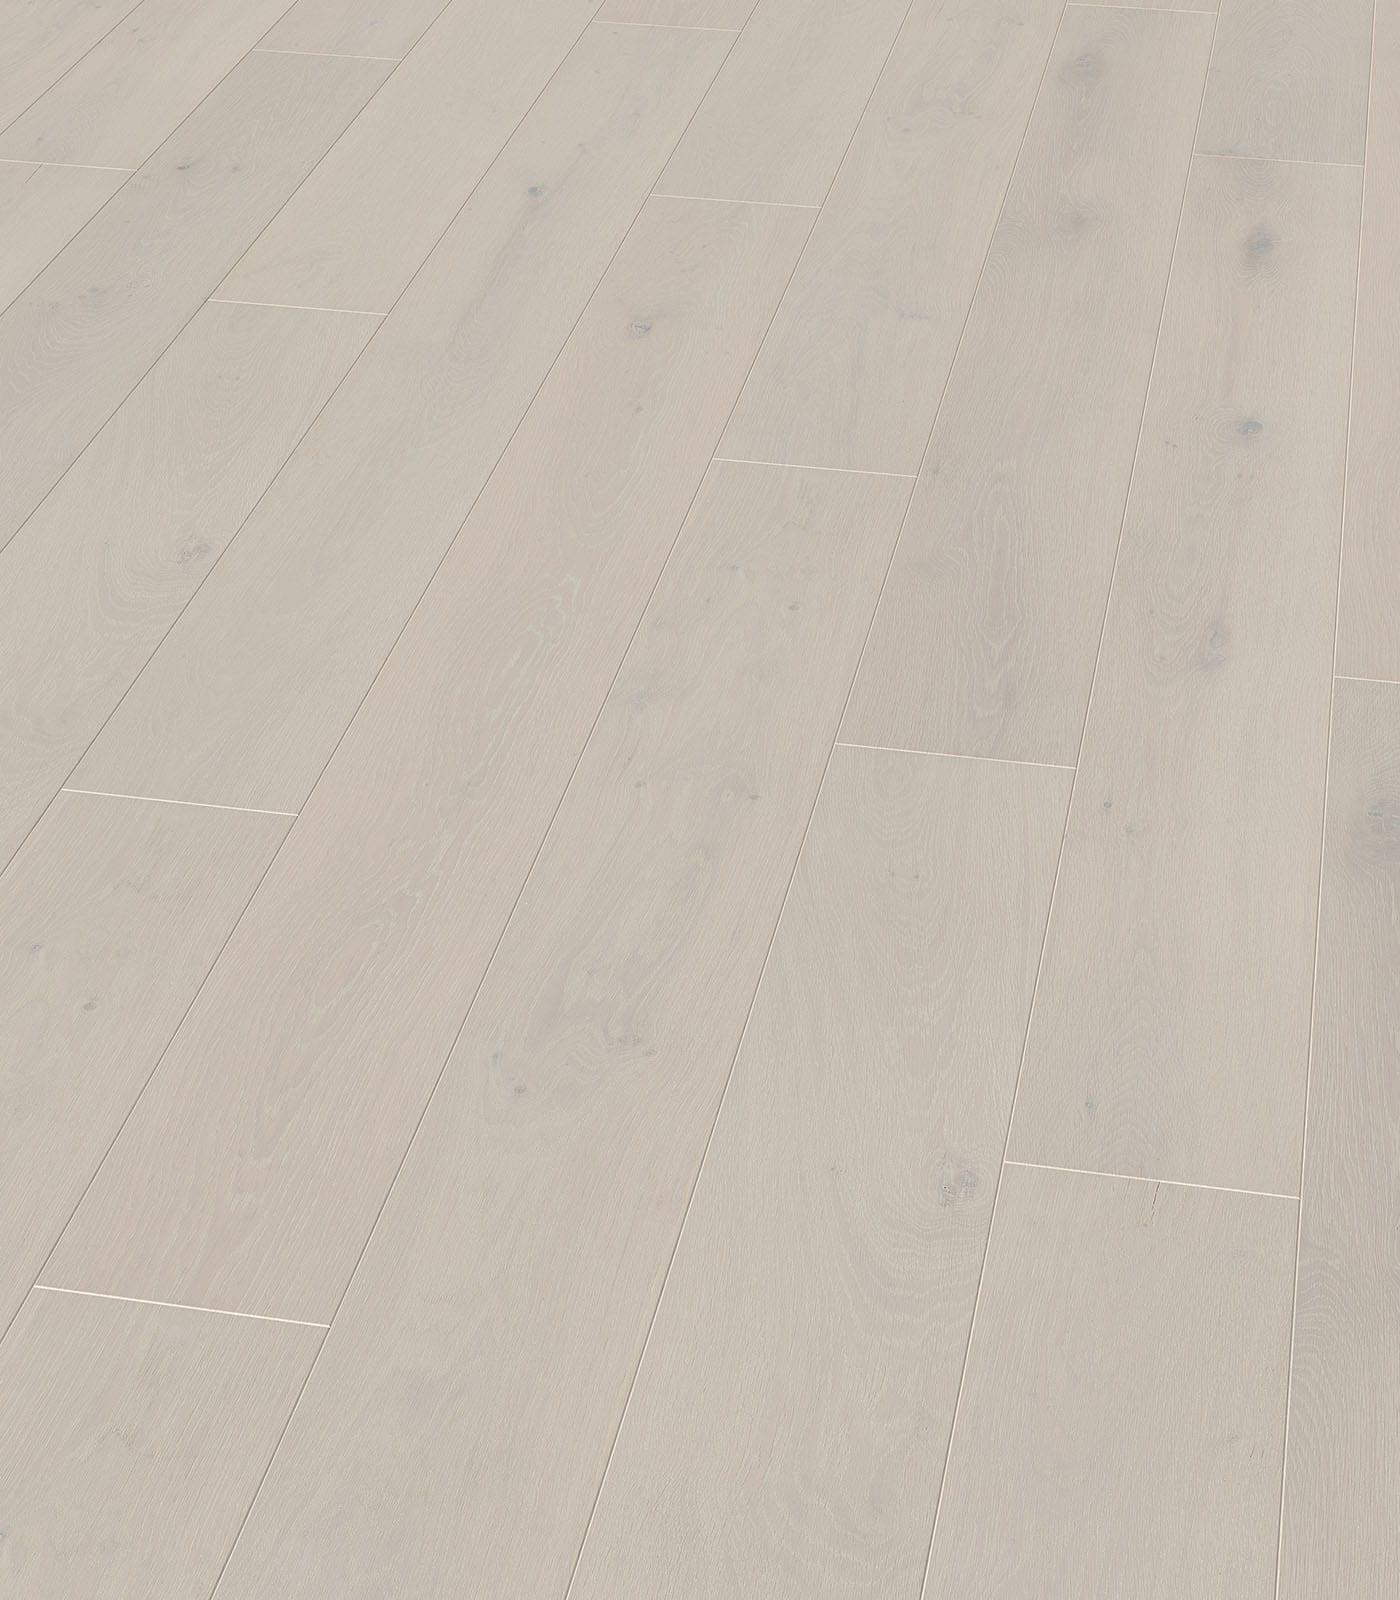 Tuscan-Colors Collection-European Oak Floors-angle